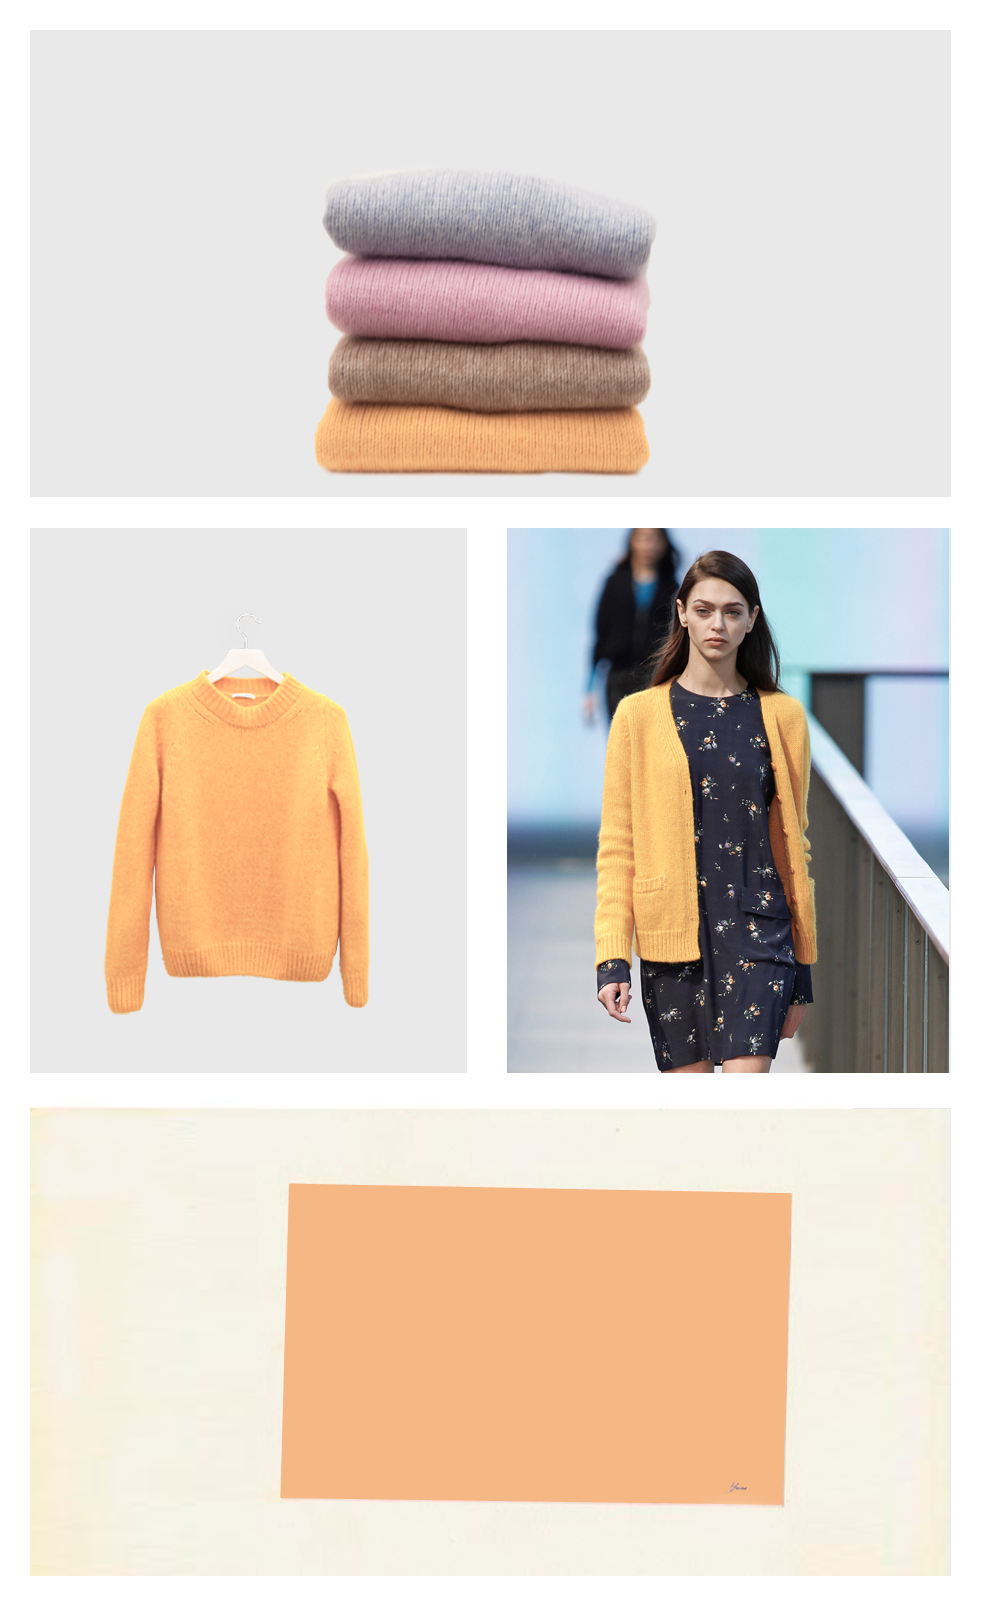 Yellow_Knit_Lebor Gabala_Sweater